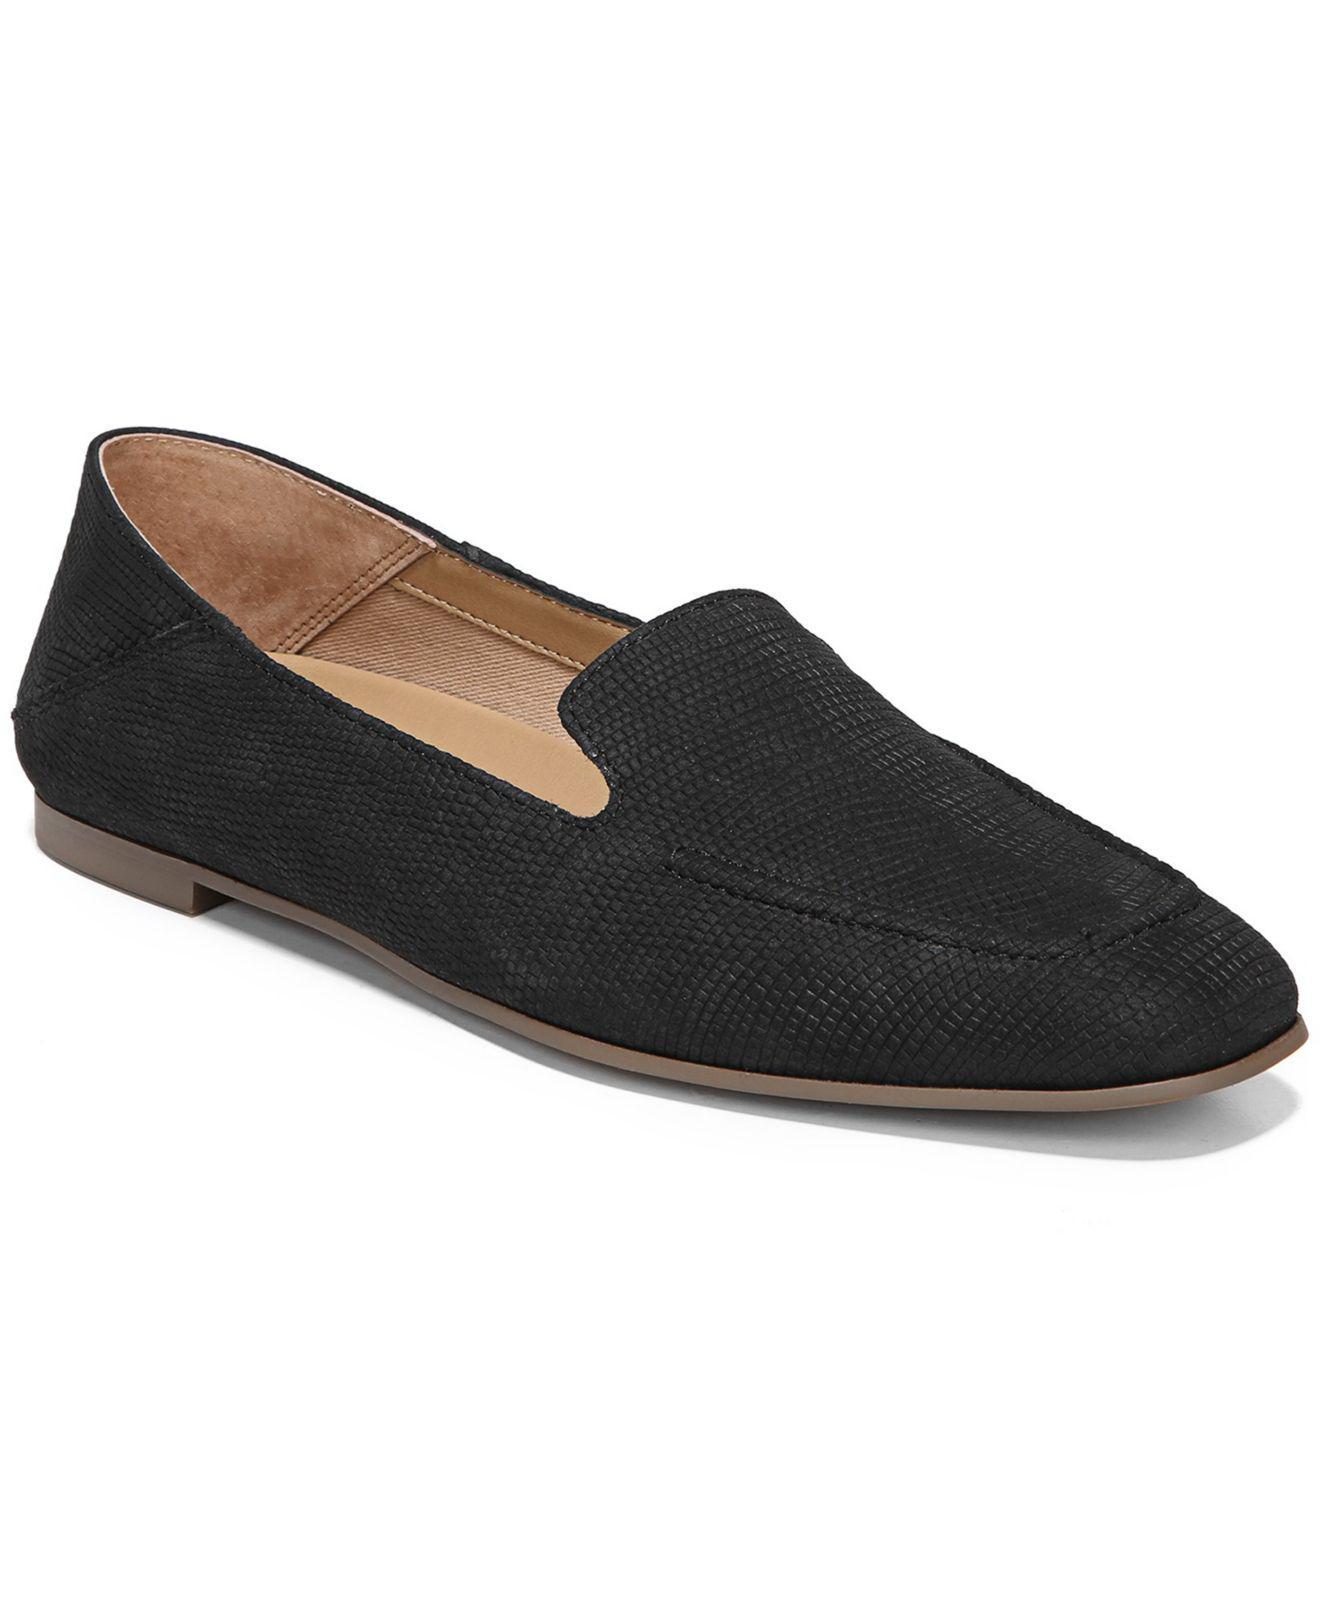 4febd1bb543 Lyst - Franco Sarto Gracie Loafers in Black